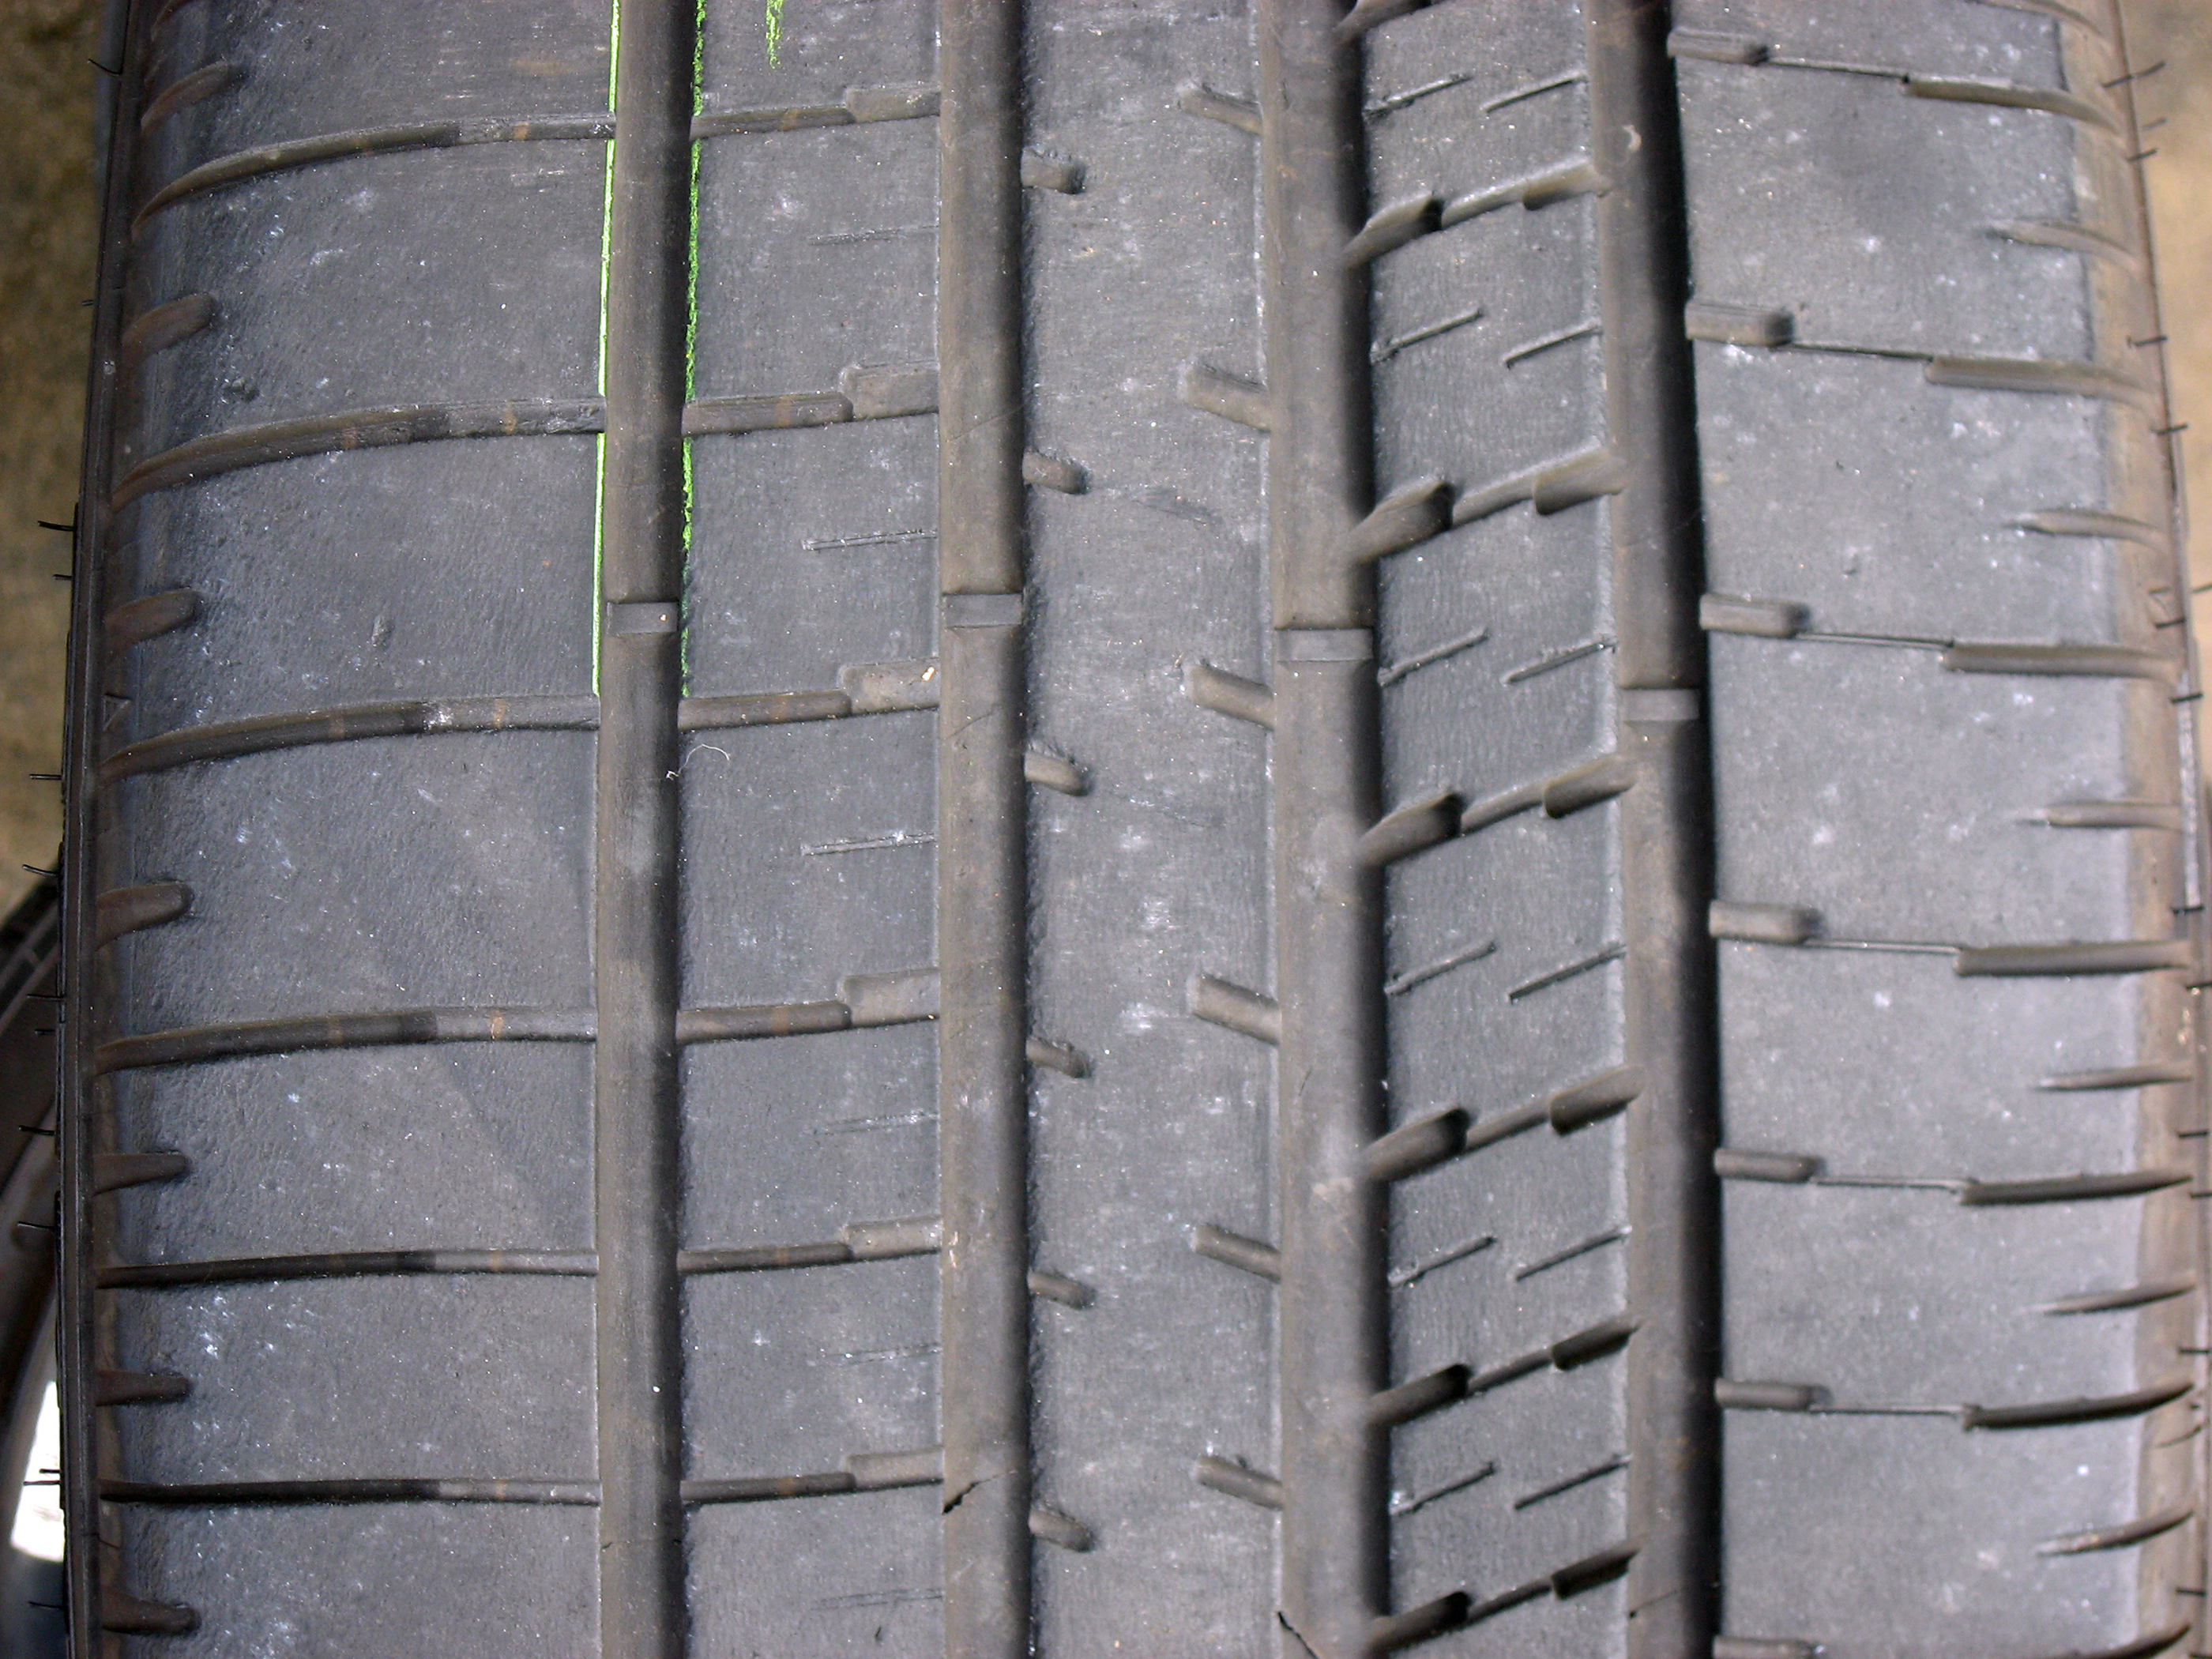 2005 Ford GT Long Term Reunion Tire Wear